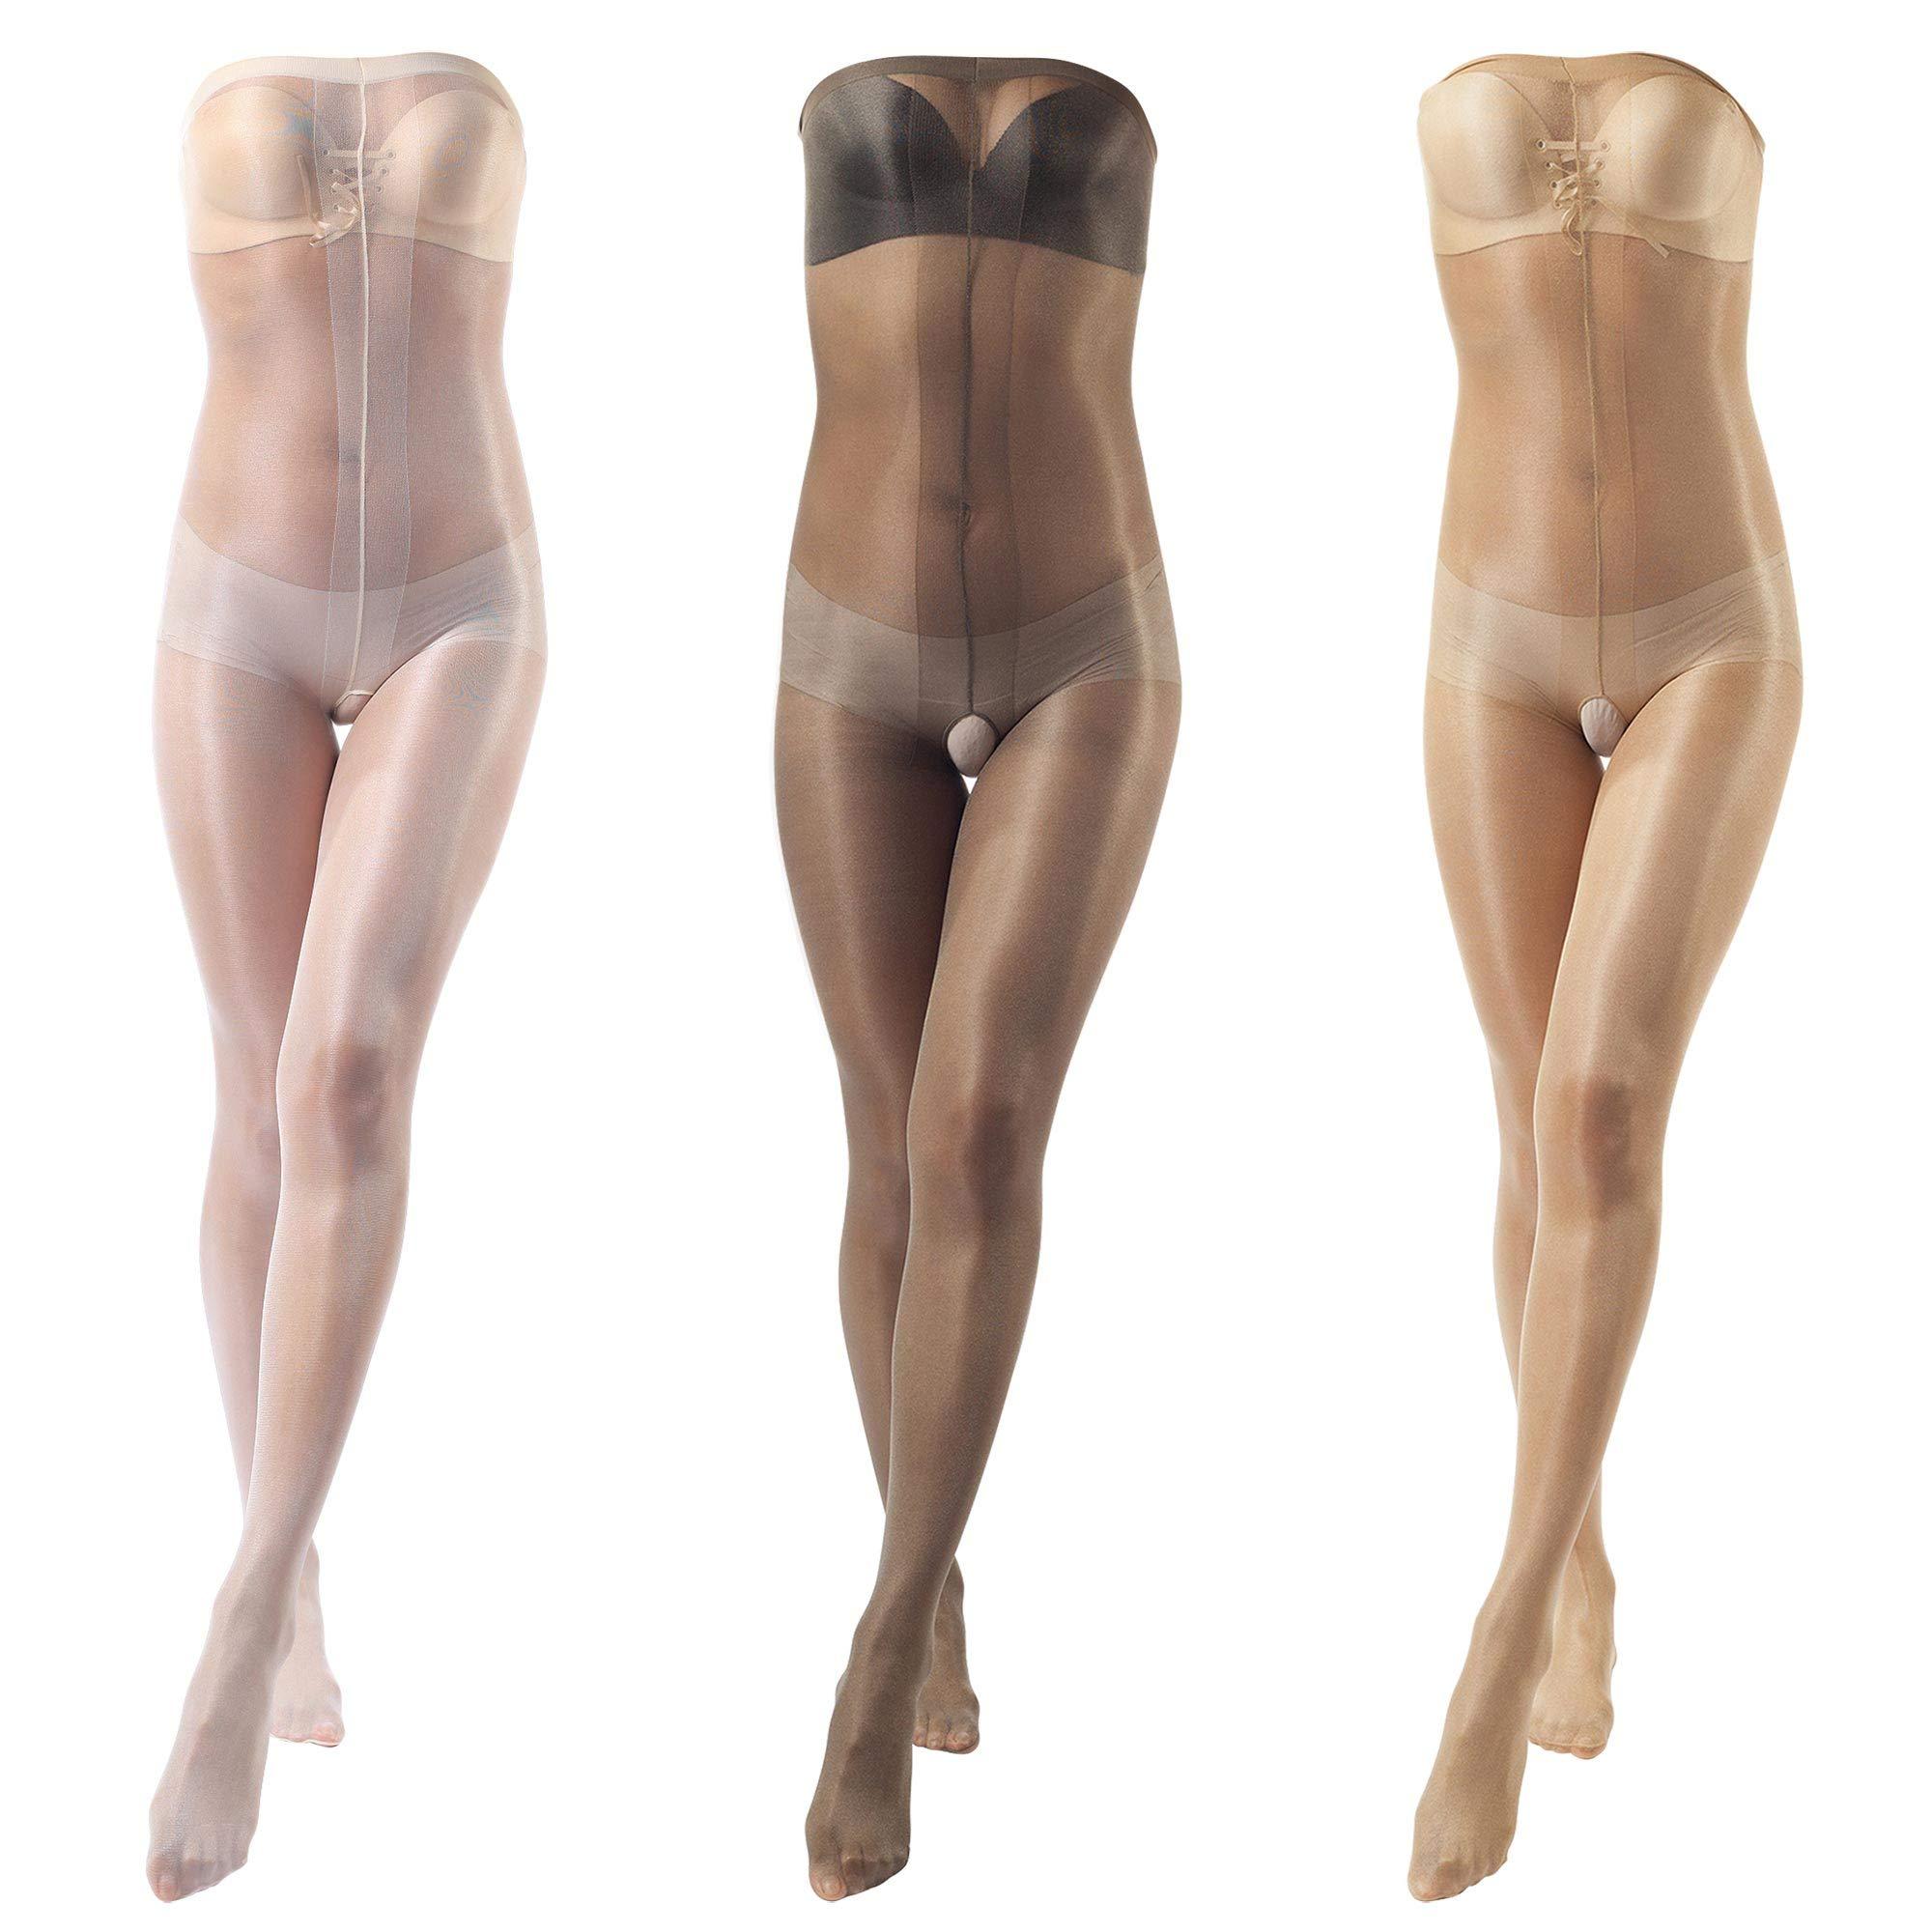 ElsaYX Women's Shiny Toe to Bust Body Stocking Pantyhose Nightwear 3 Pairs - Beige/White/Grey One size:Height 4'9''-5'7''